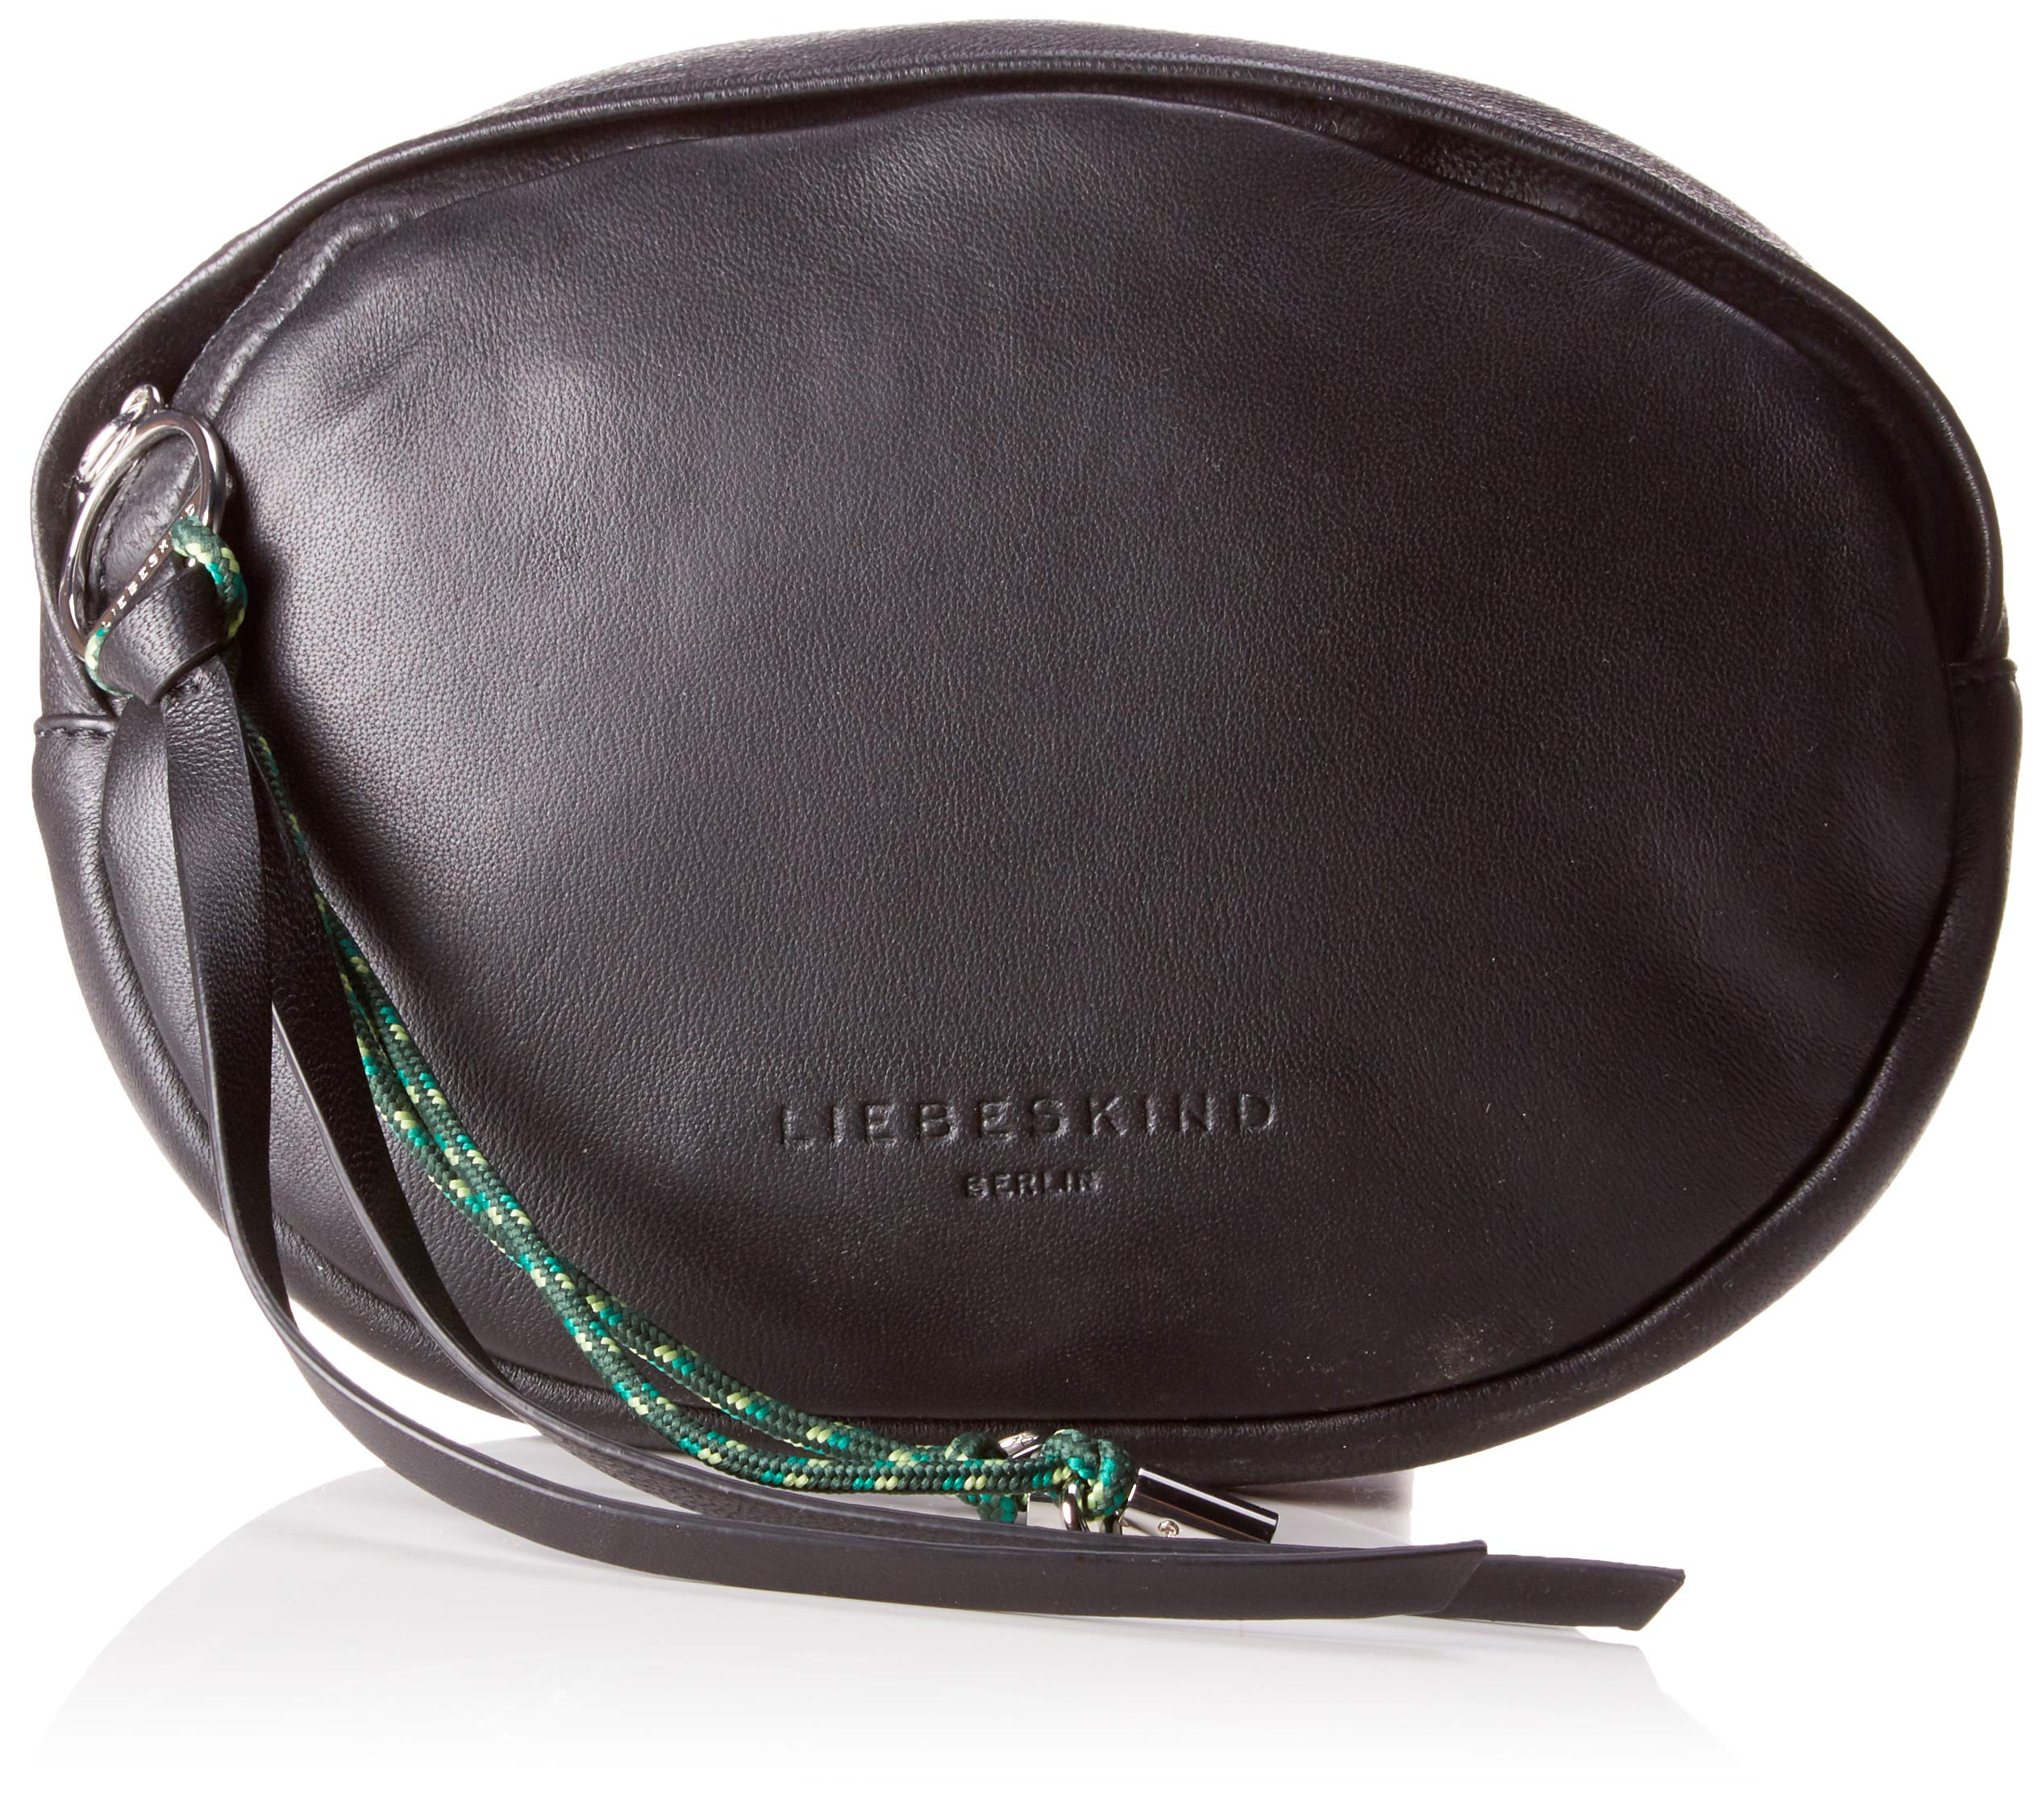 H Berlin X Liebeskind Bandoulière BeltbagSacs Bag Cmw Dive FemmeNoirblack2x16x19 L T1cFlKJ3